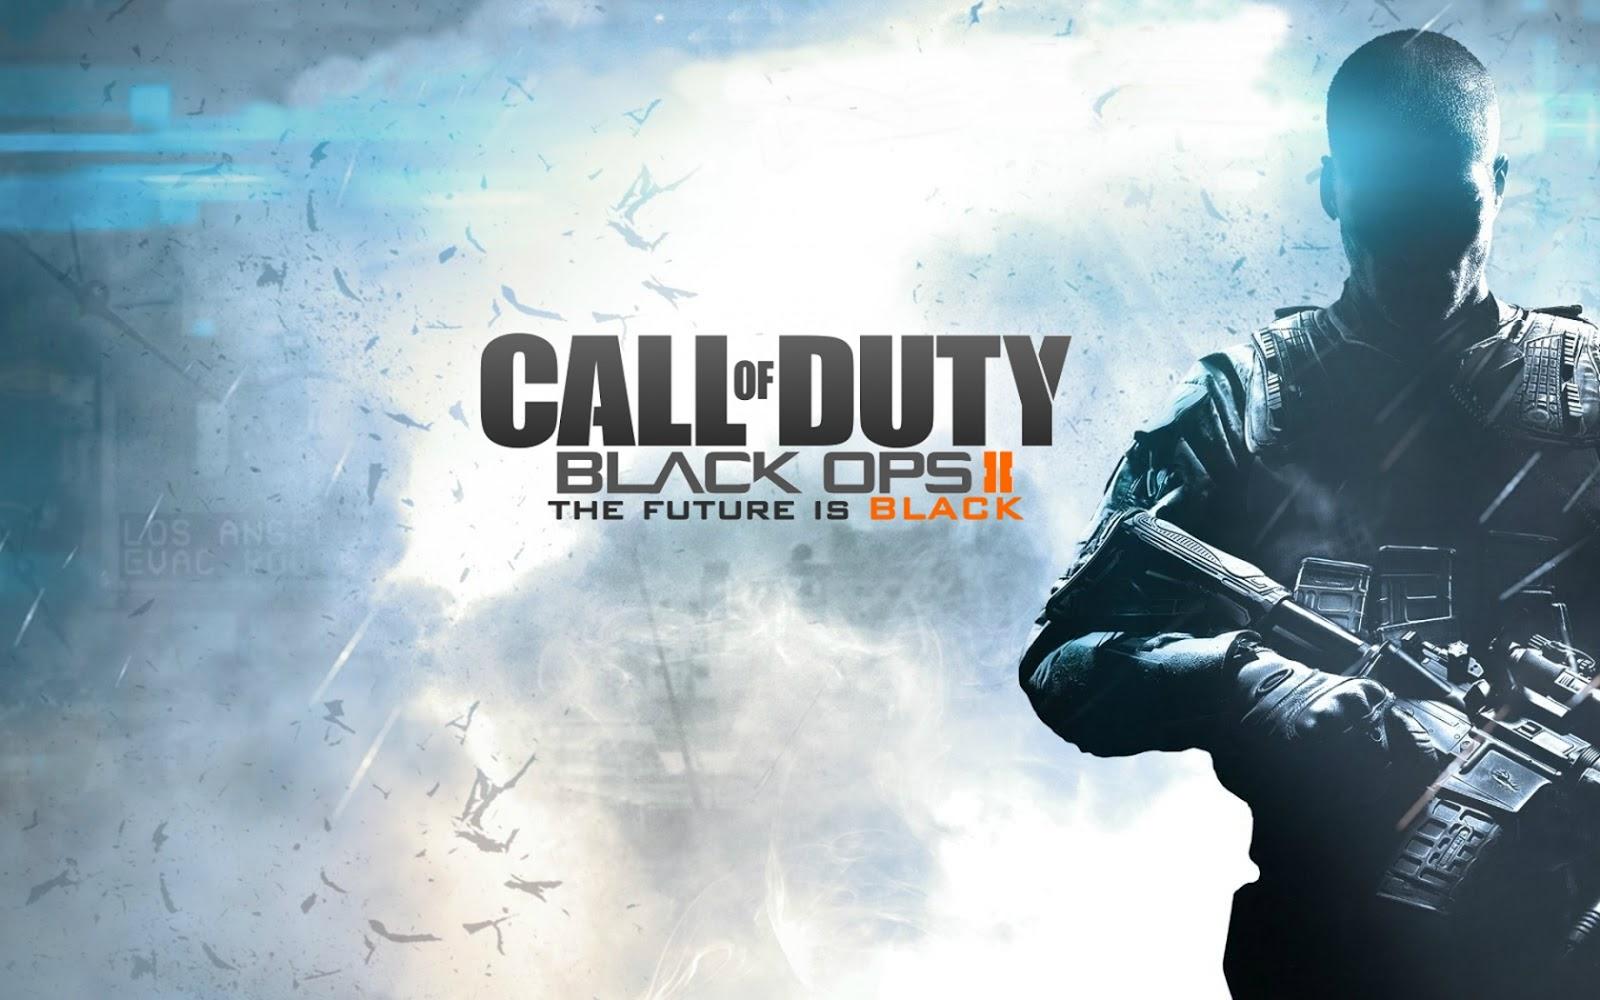 http://2.bp.blogspot.com/-BXoIxDAWejc/UFFzTbecFtI/AAAAAAAAJMM/SzY_Mhm4U8c/s1600/Call_of_Duty_Black_Ops_II_Latest_HD_Desktop_Wallpaper.jpg